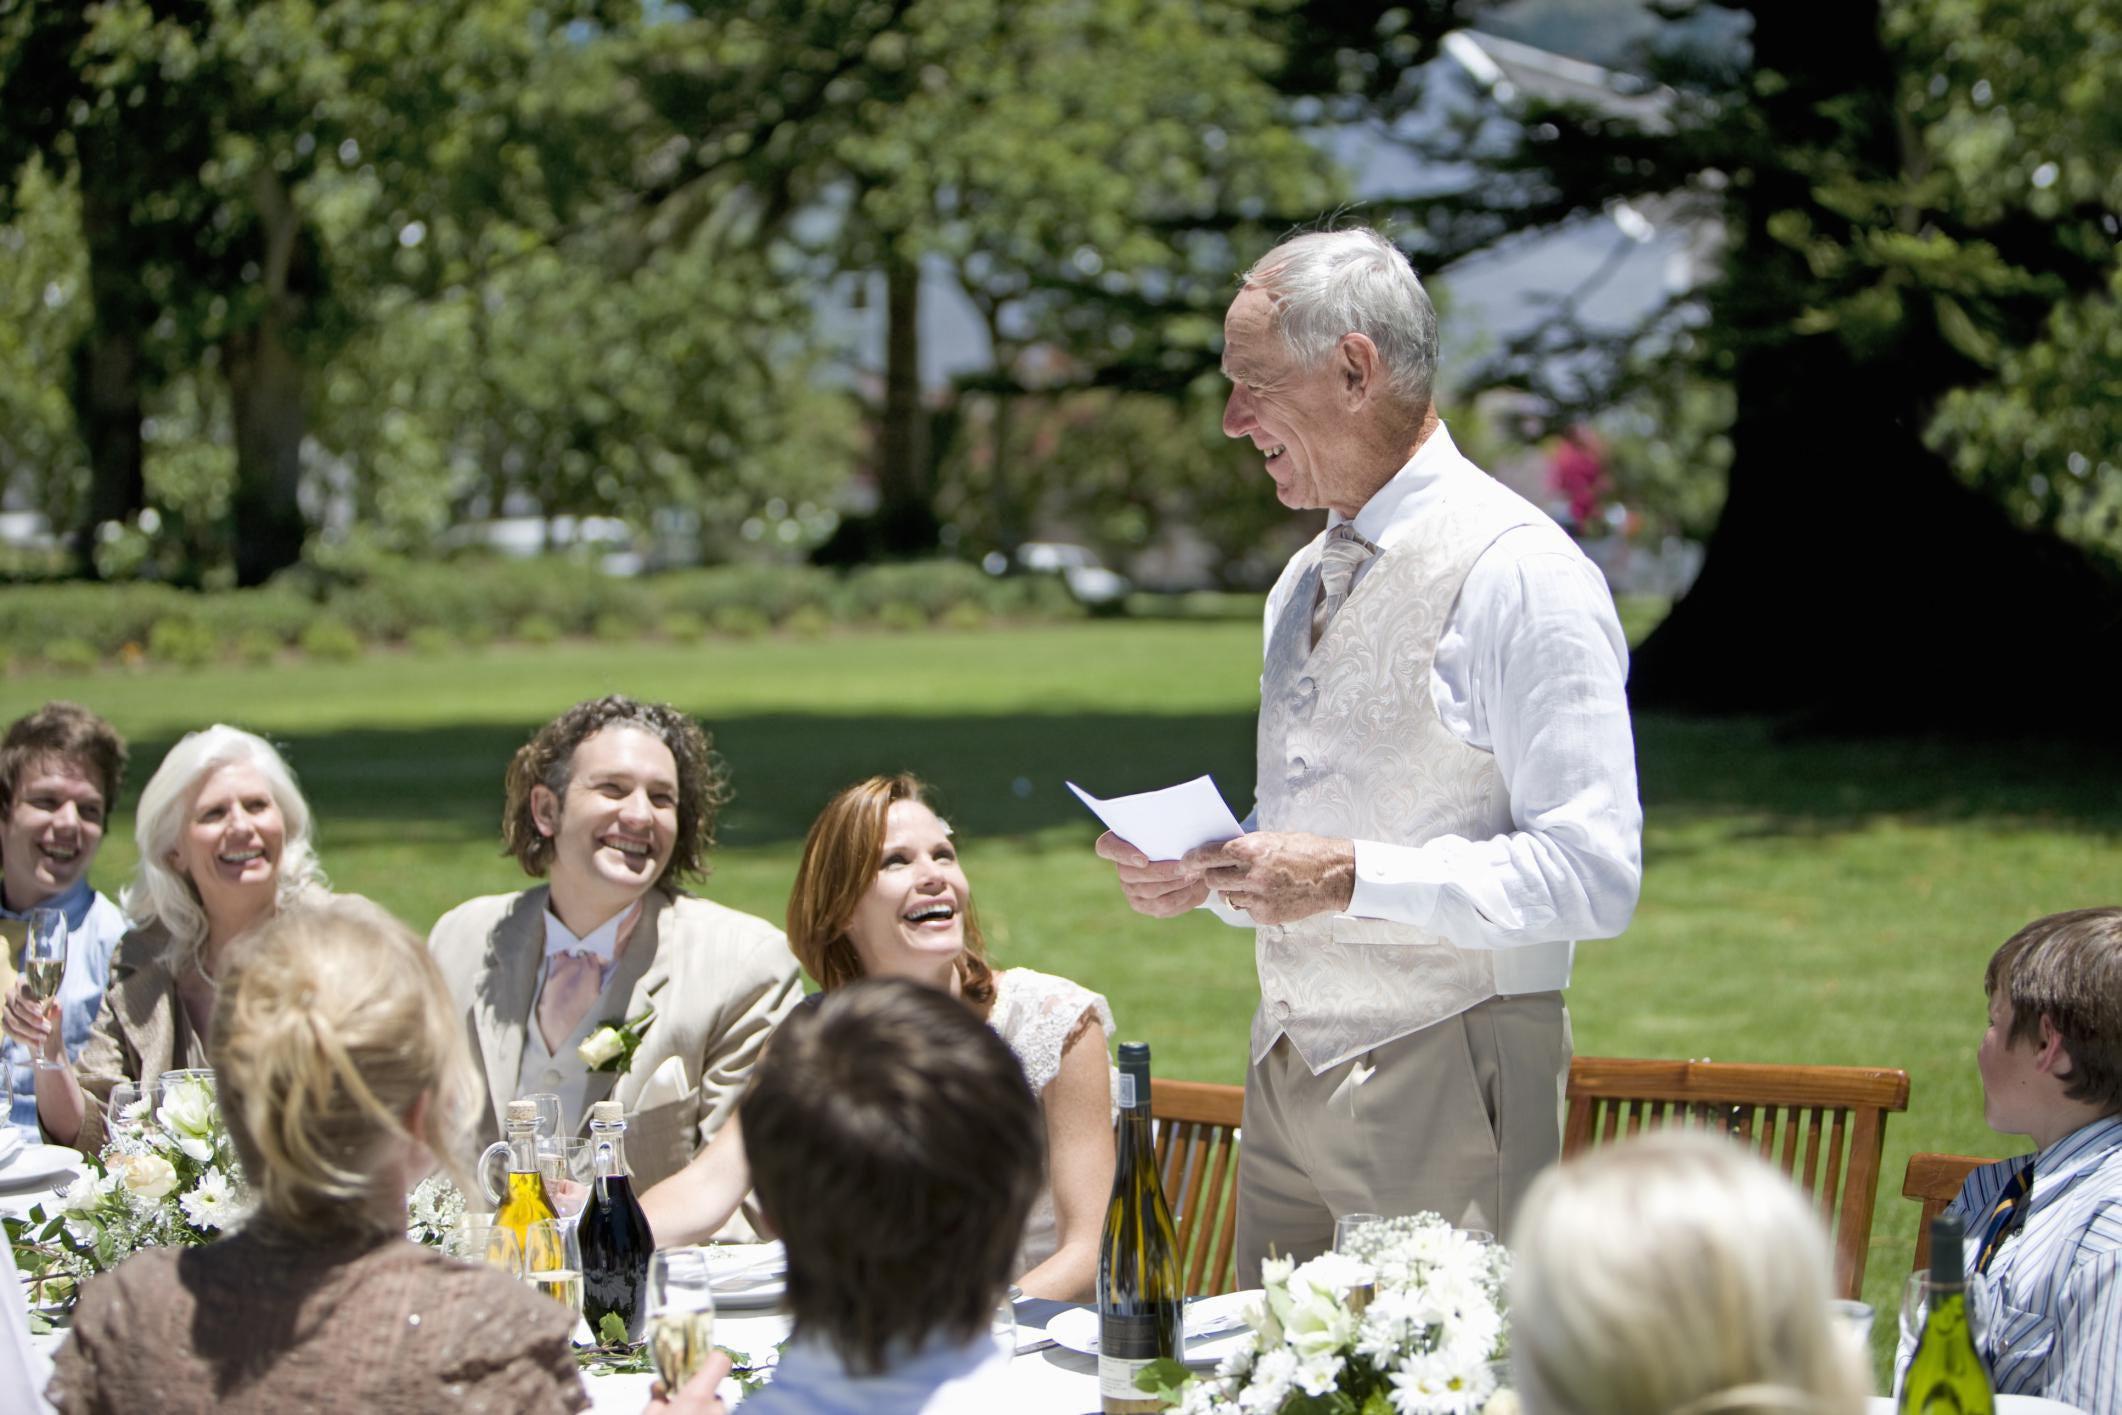 Bride Wedding Speech Ideas: Father Of The Bride Wedding Speeches